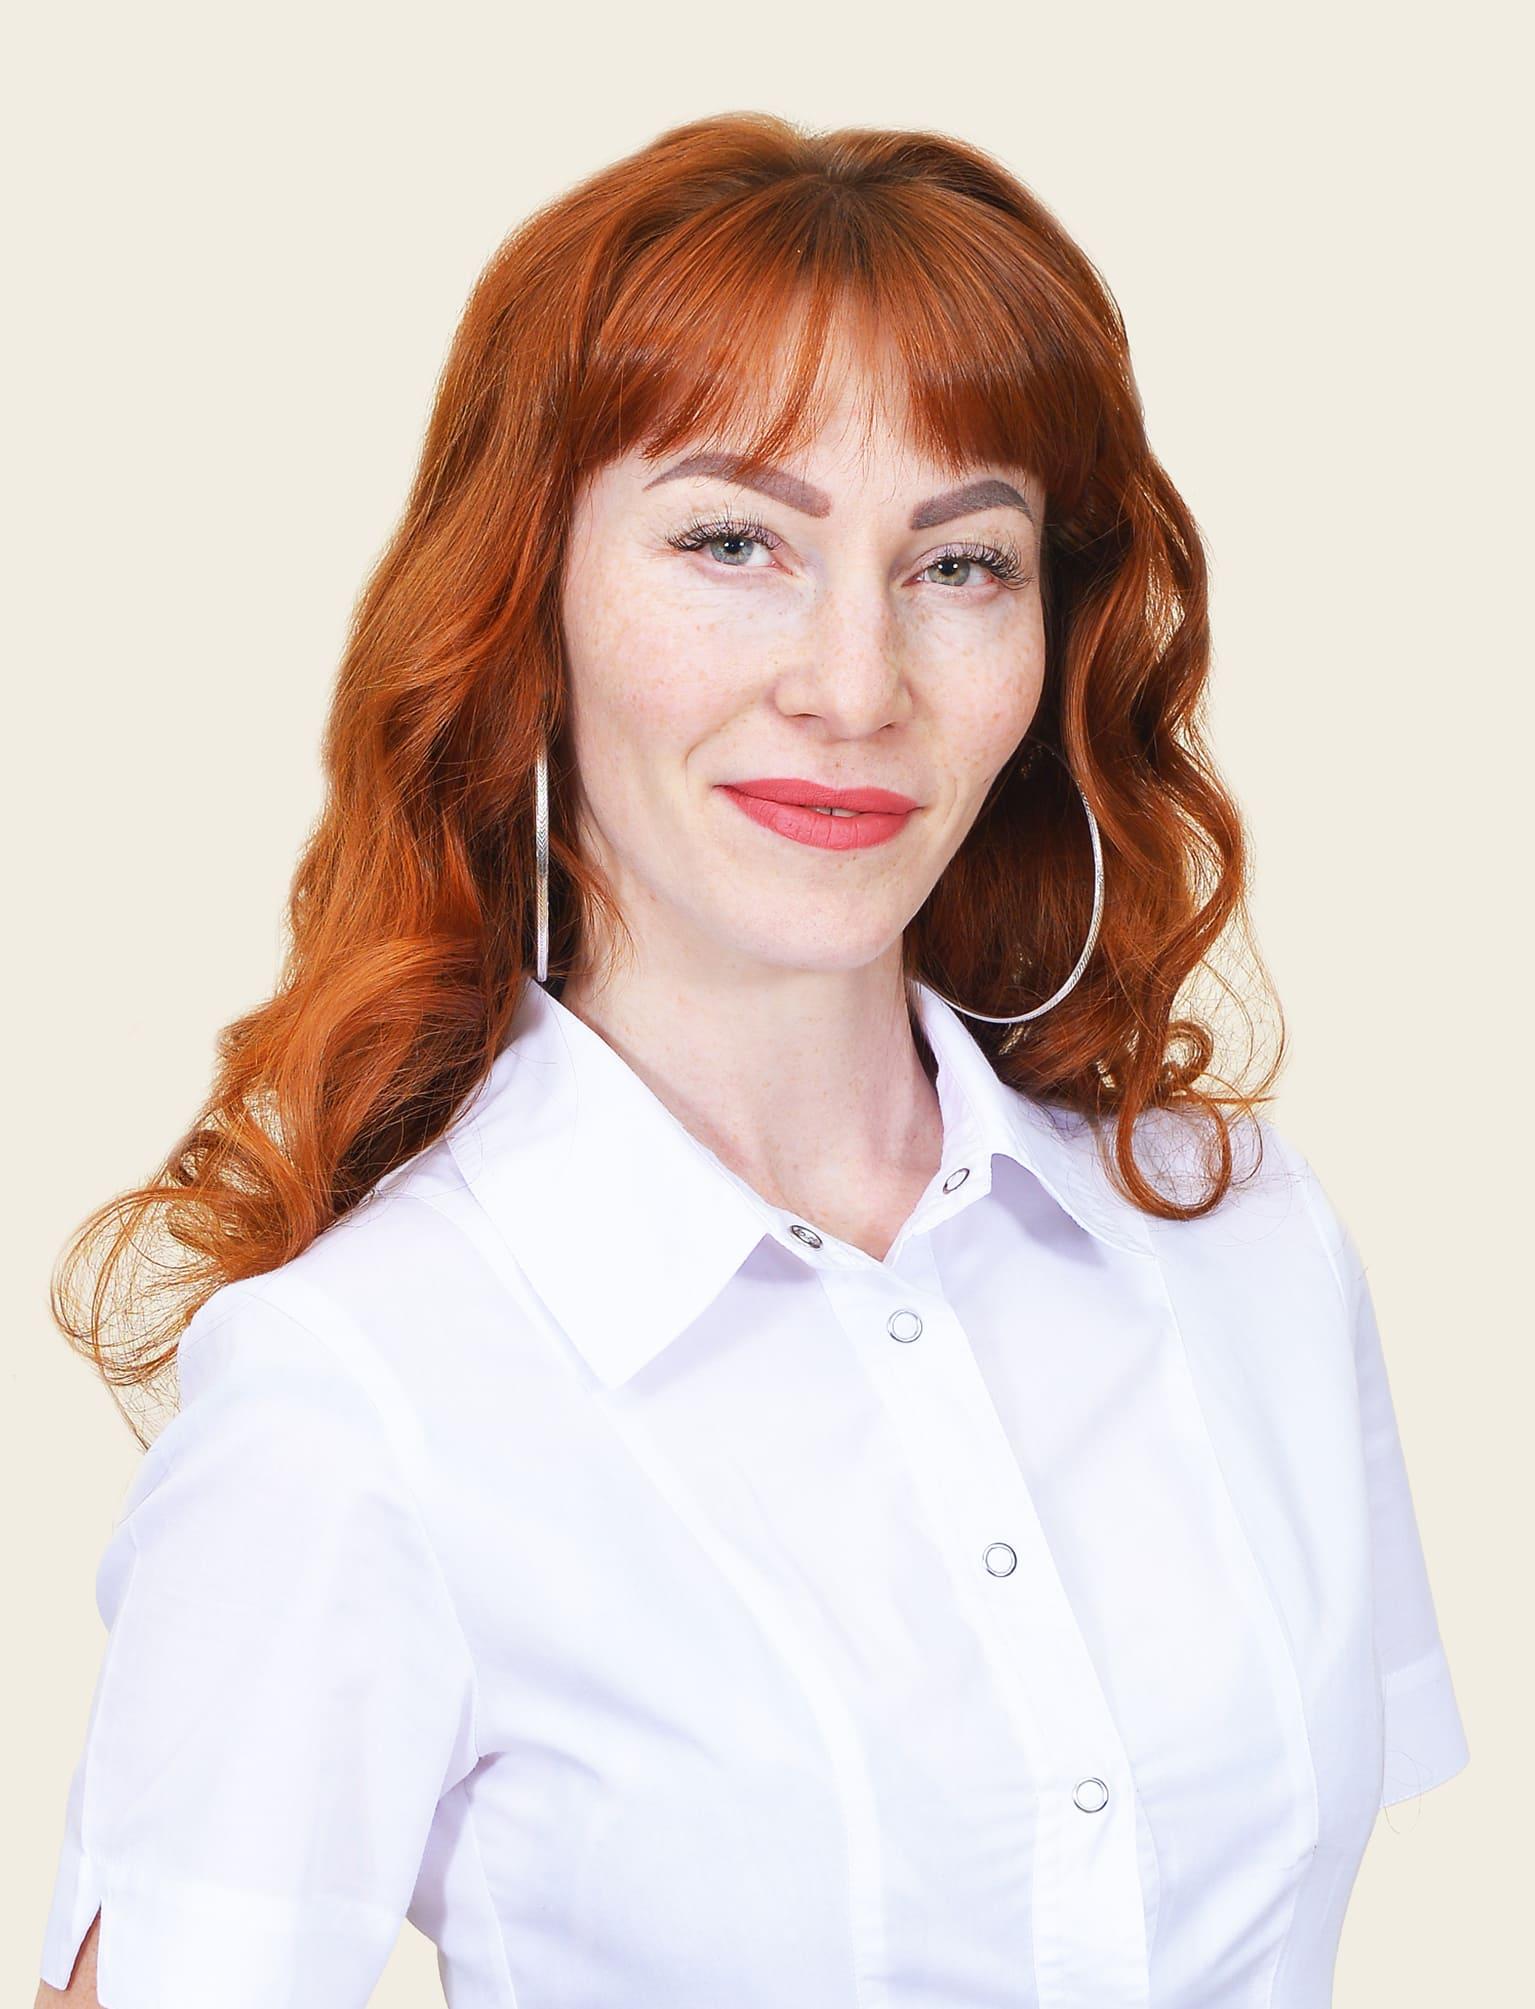 Тарасюк Дарья Игоревна